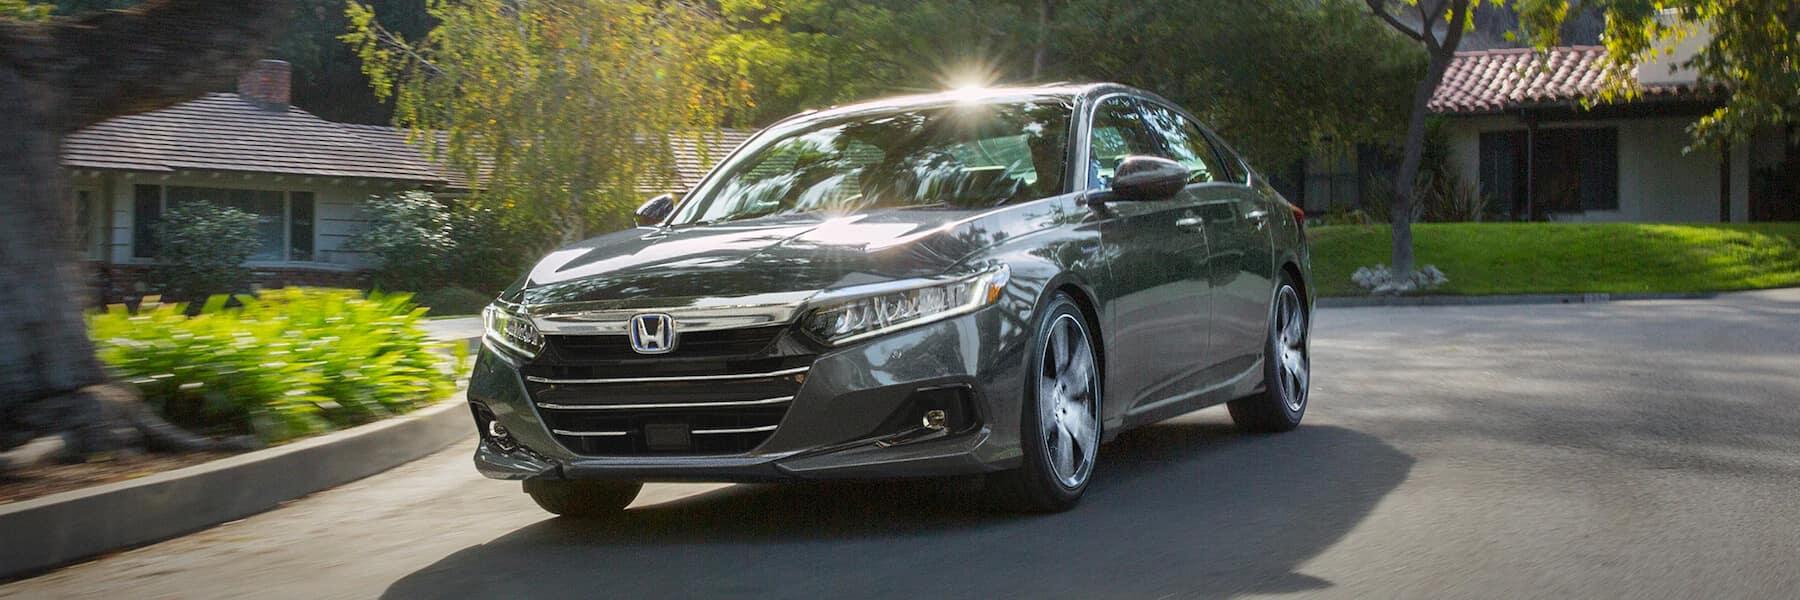 Honda Is Most Fuel Efficient Automaker Slider